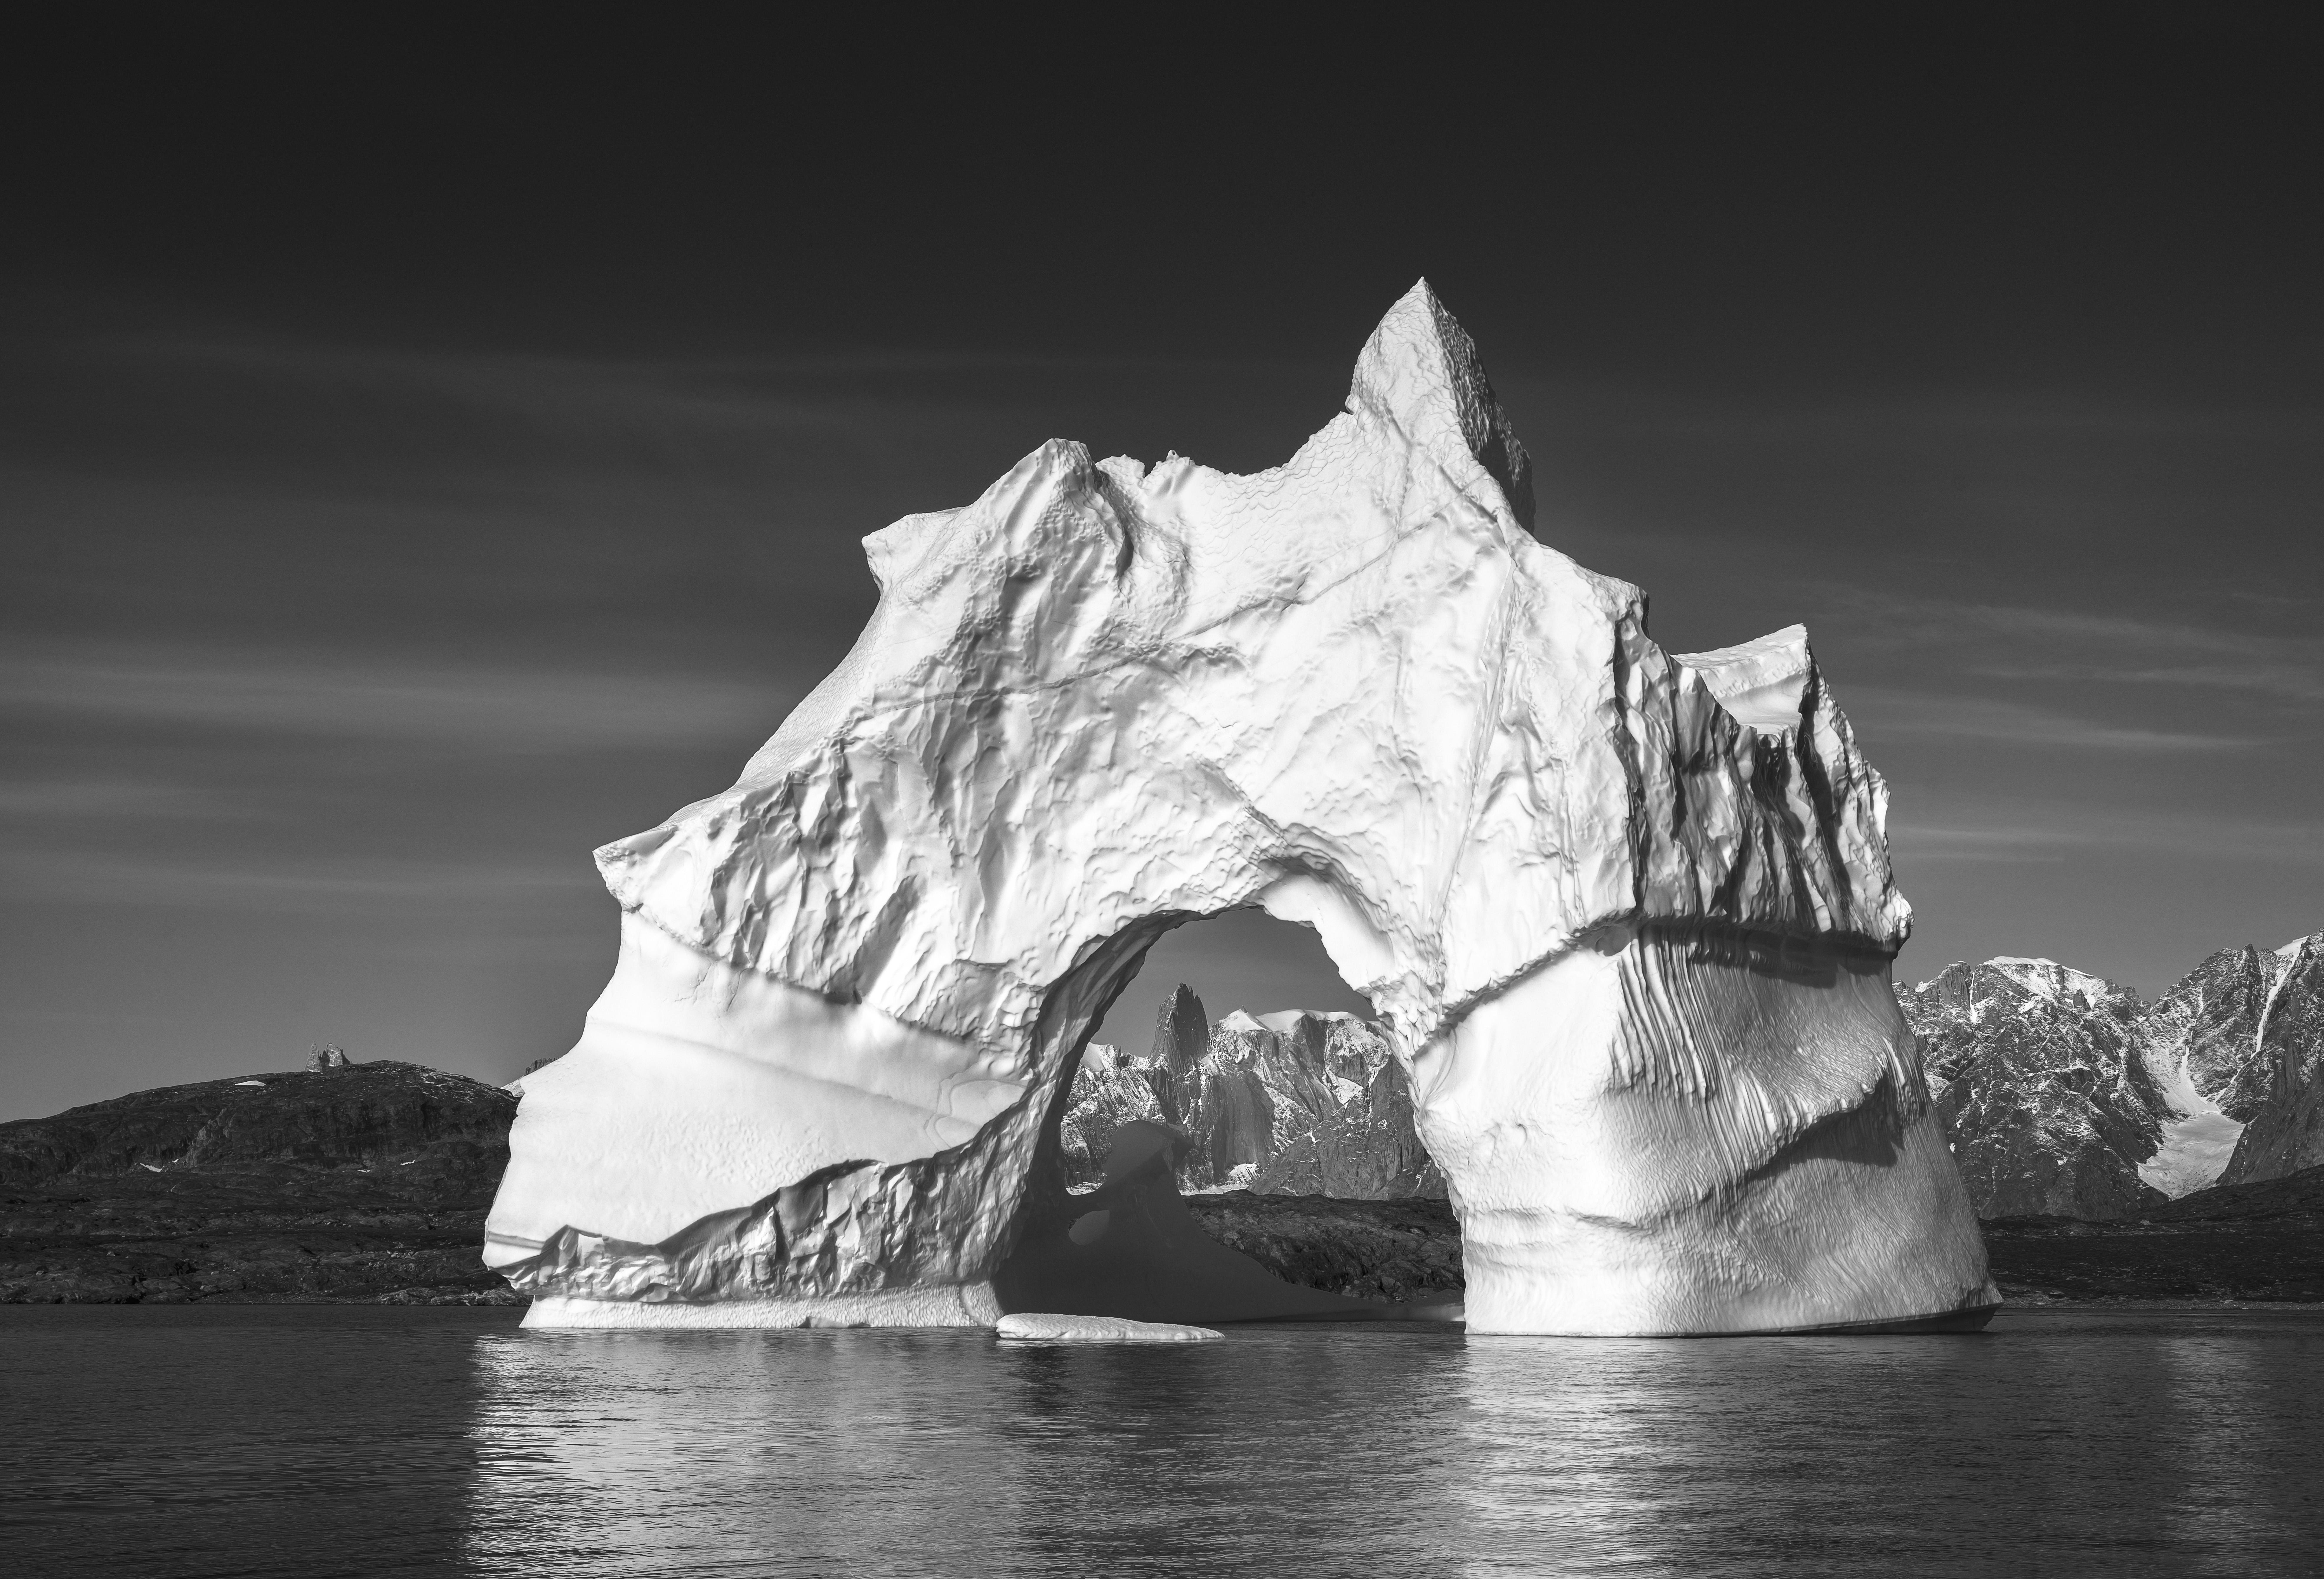 Eric專業攝影師鏡頭下的北極風光。© Eric Wong / Greenpeace